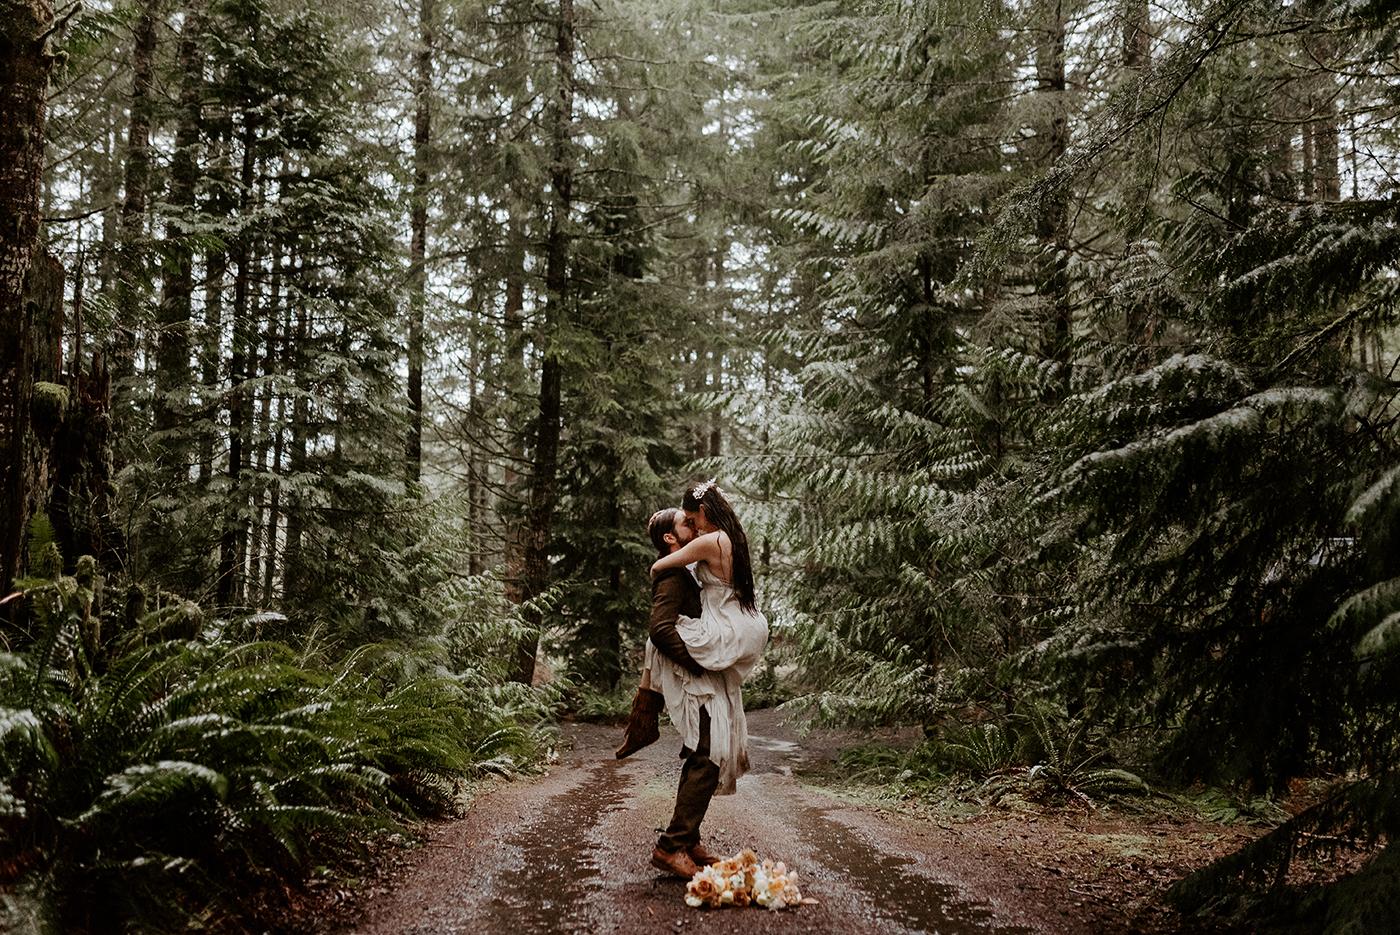 The Woodlands House Sandy Oregon Elopement PNW Wedding How To Plan A Destination Elopement Anais Possamai Photography 9